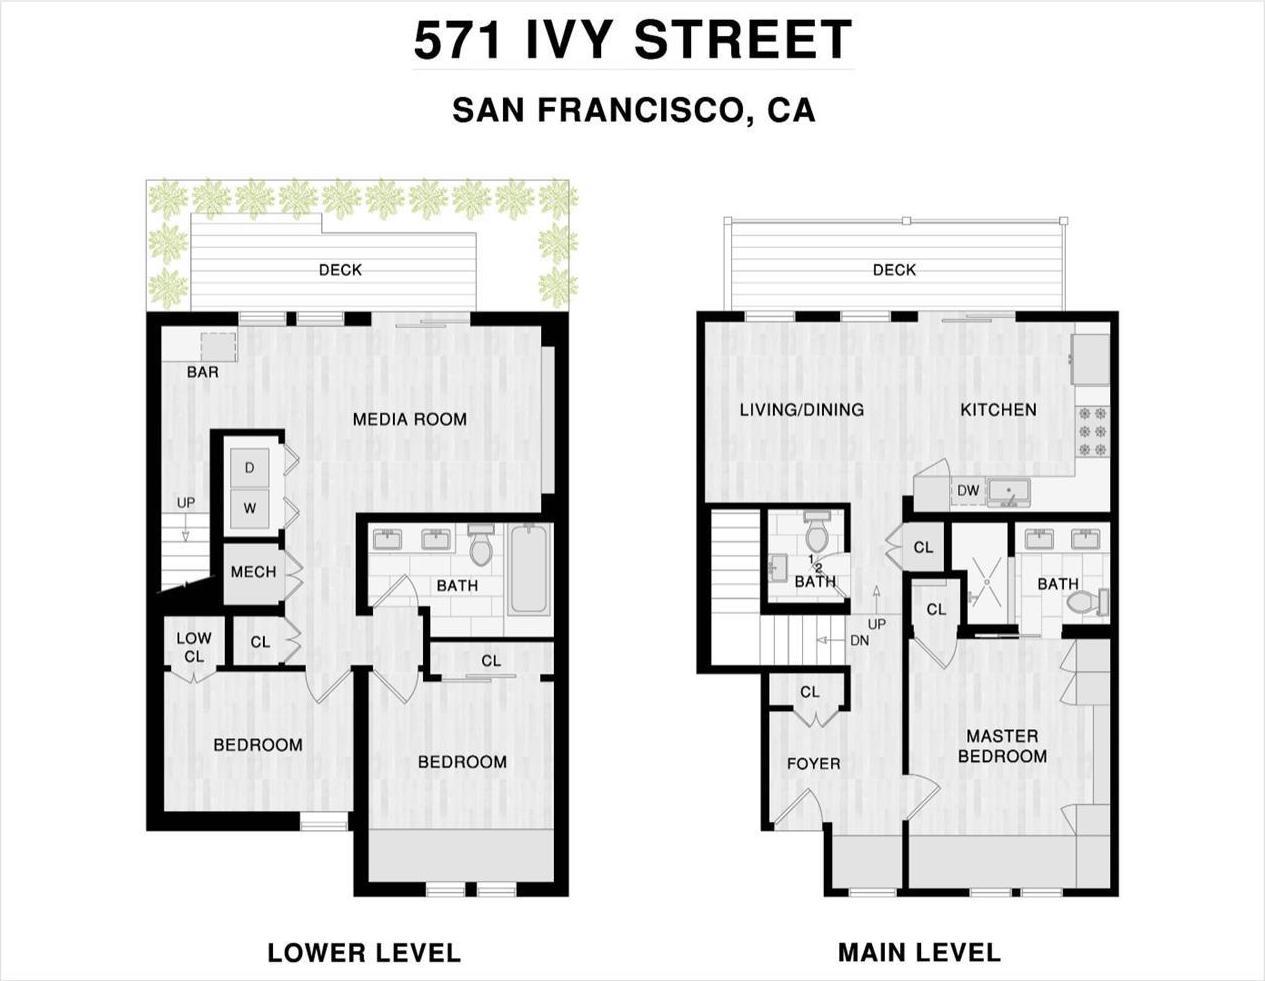 571 Ivy Street photo